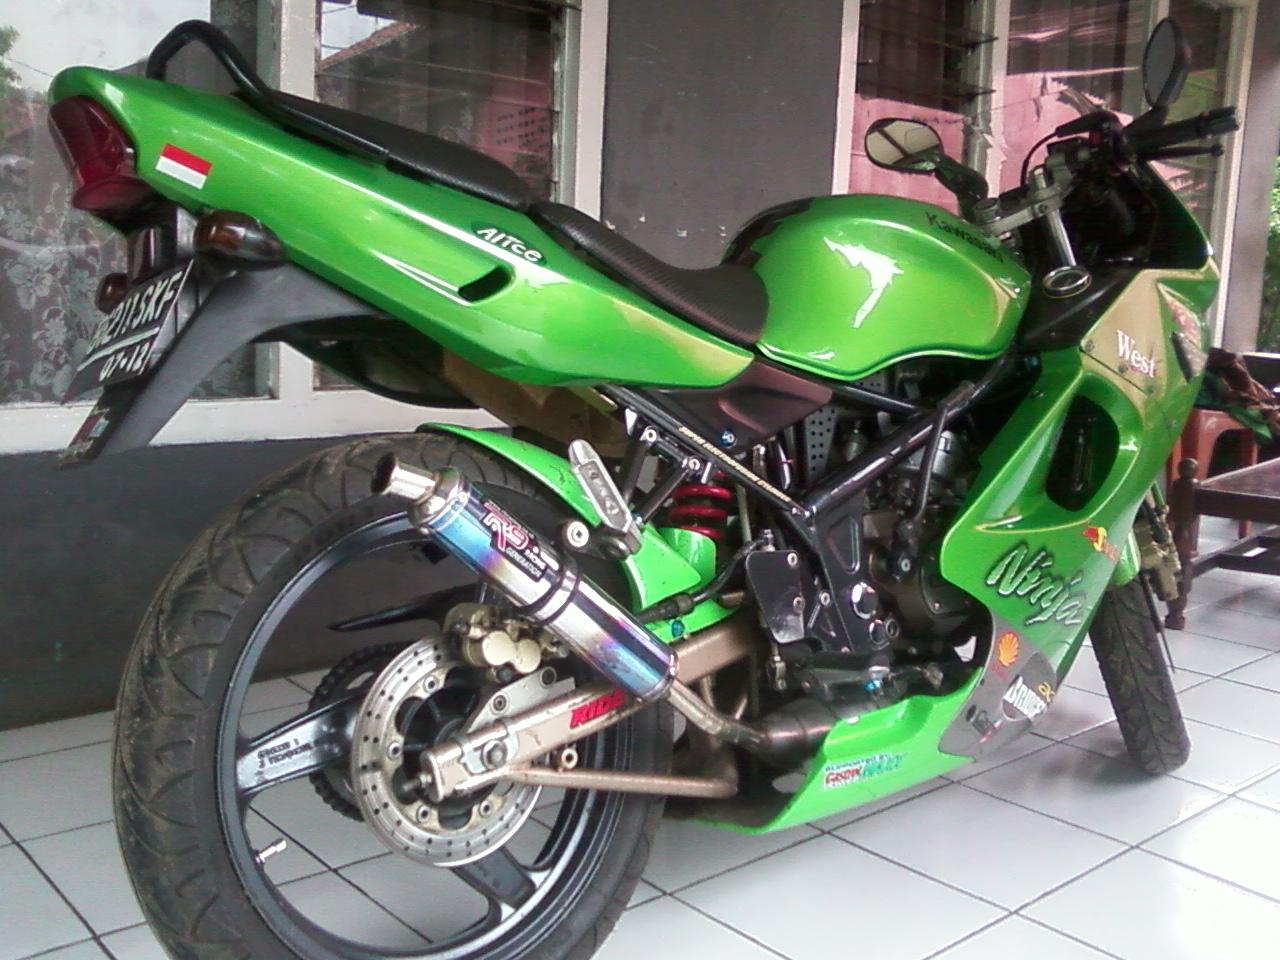 P Of Kobagus Motor Kawasaki Ninja May Nfl Wallpapers